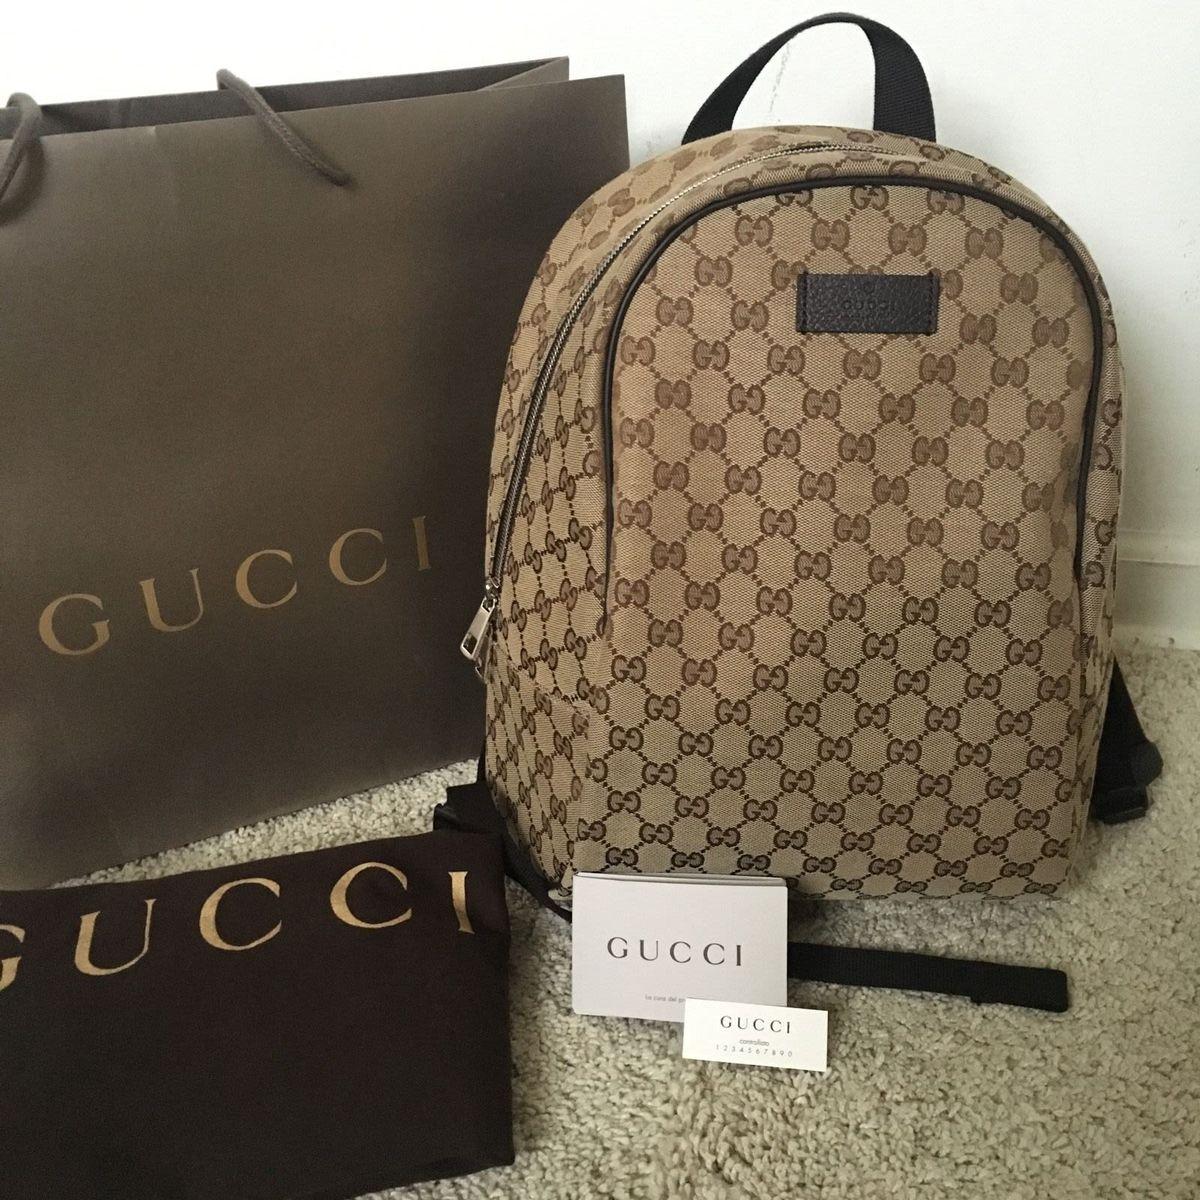 28f8d5732 Mochila Gucci Canvas Gg Backpack | Mochila Feminina Gucci Usado 19717327 |  enjoei